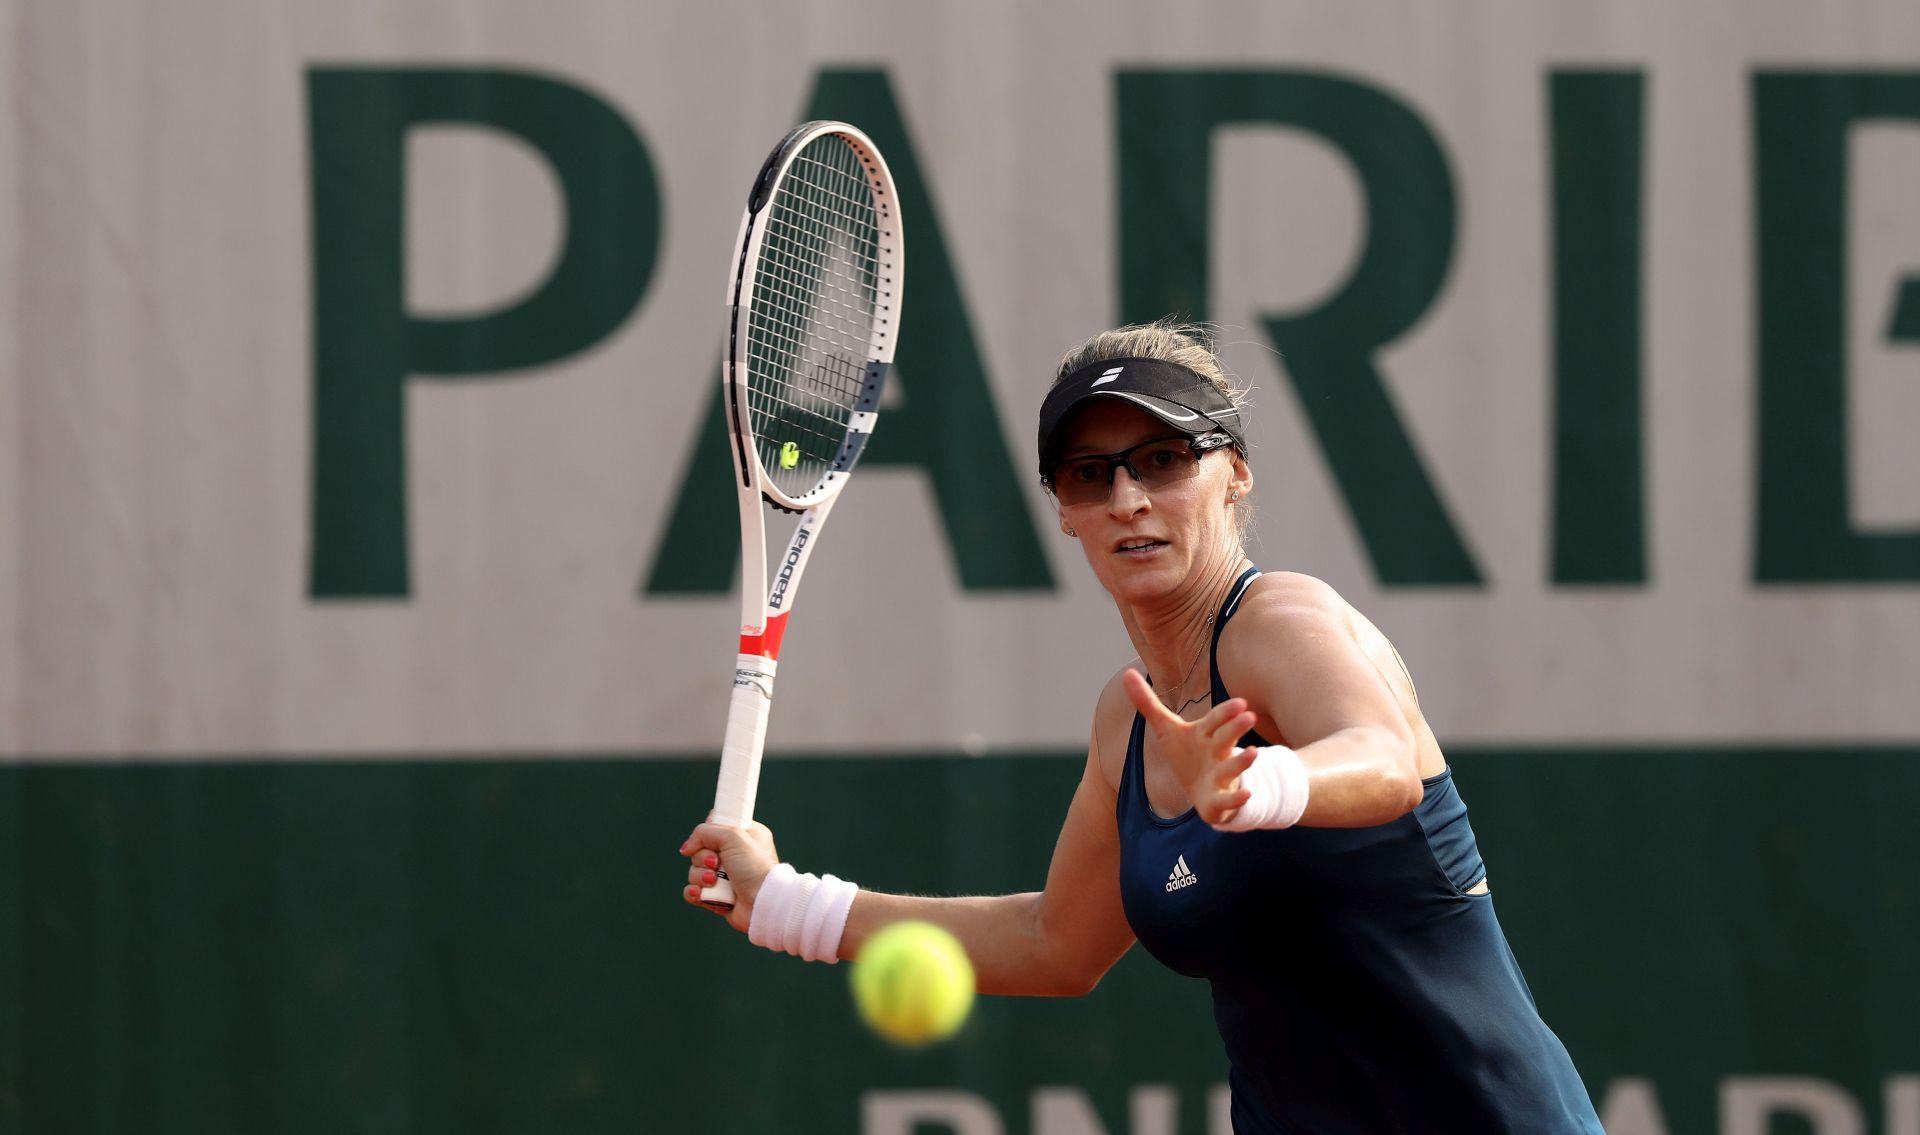 WTA Lučić Baroni pala tri mjesta